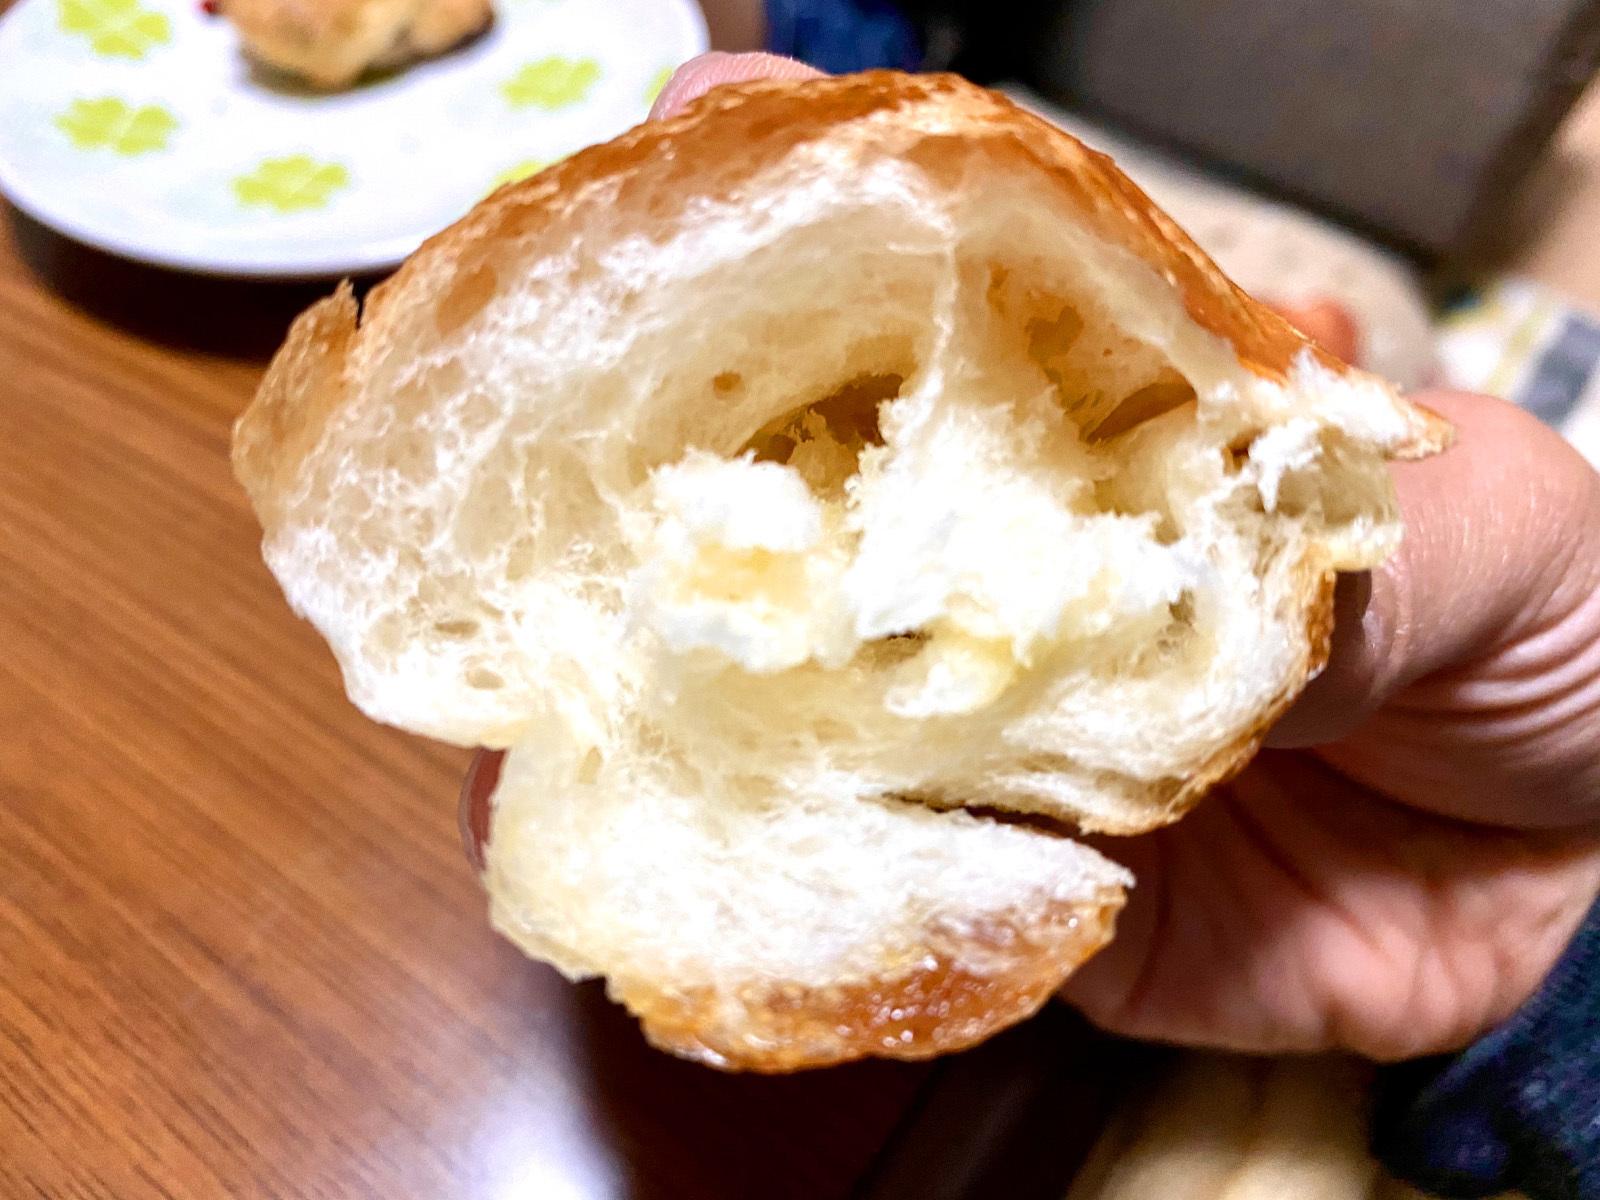 石窯パン工房PaPaBeRu 丸亀店 07 塩パン (断面)